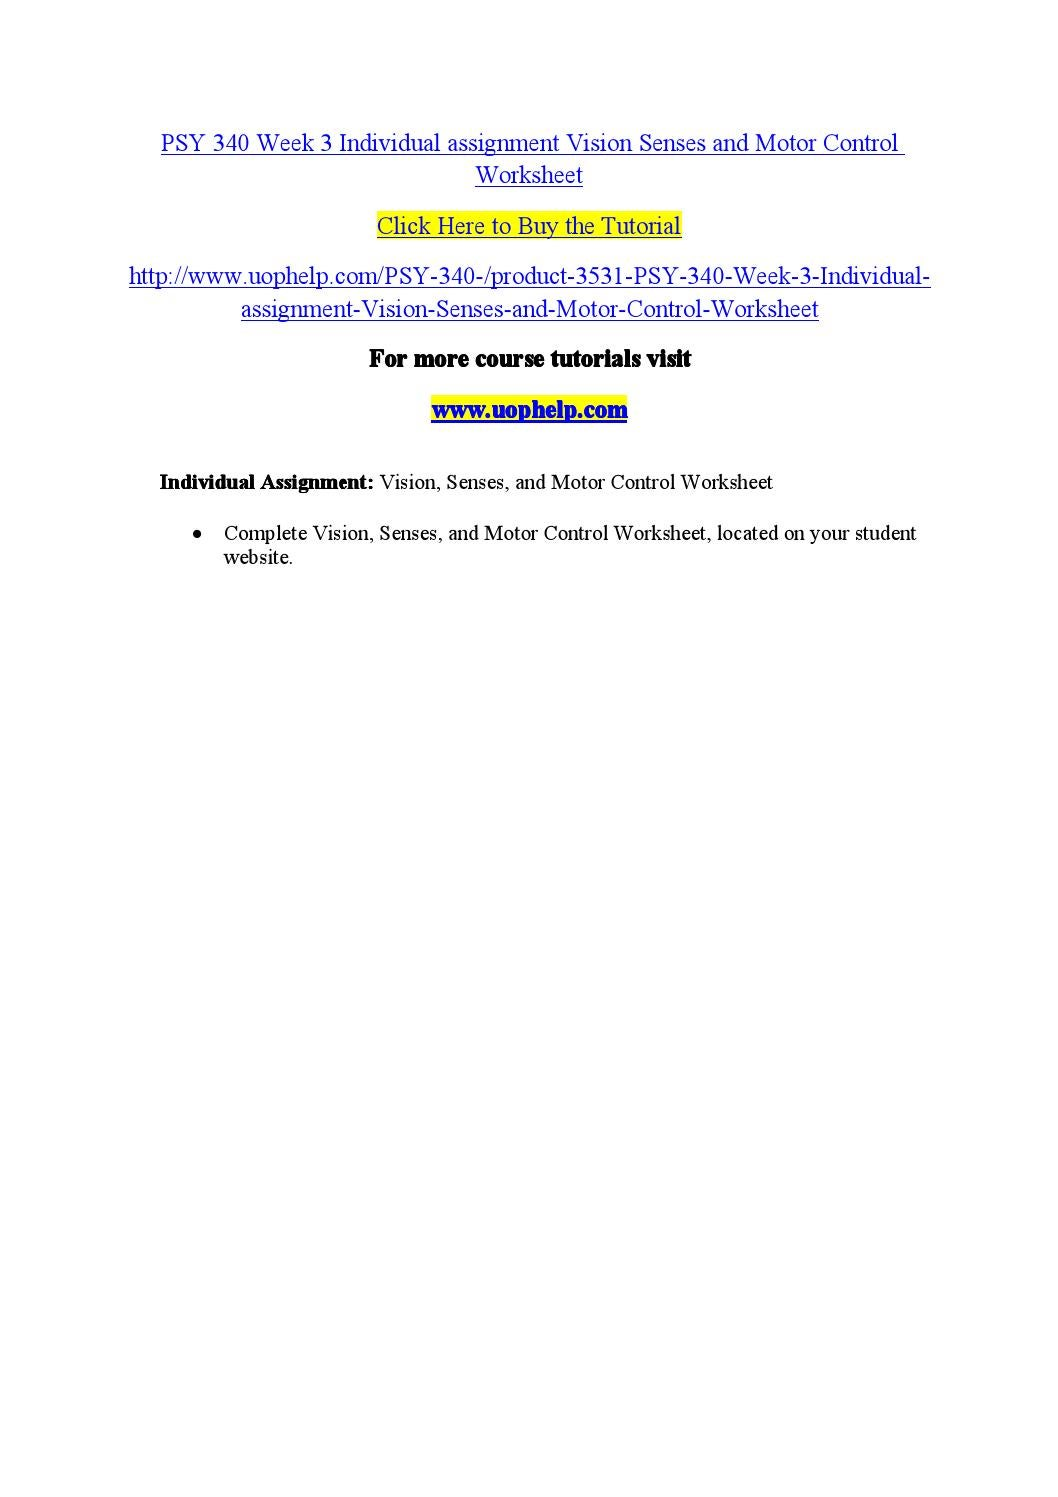 vision senses and motor control worksheet psy 340